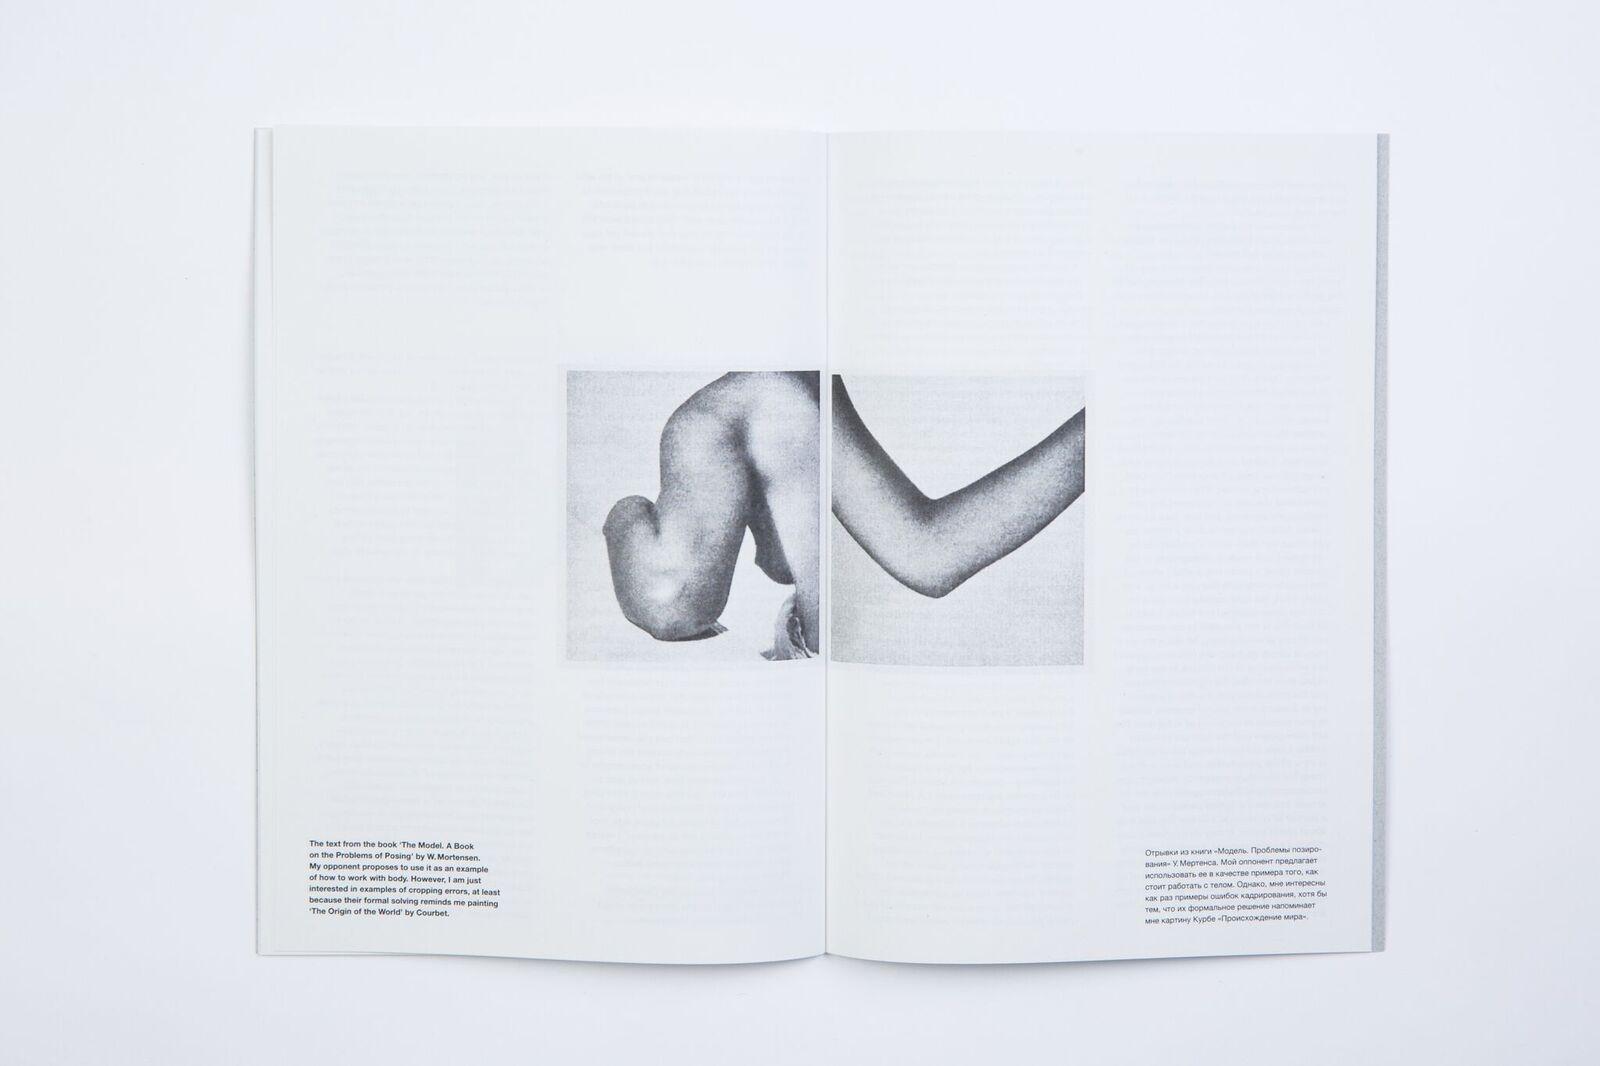 Amplitude 1 Yury Gudkov On Photography And Fundamentalism